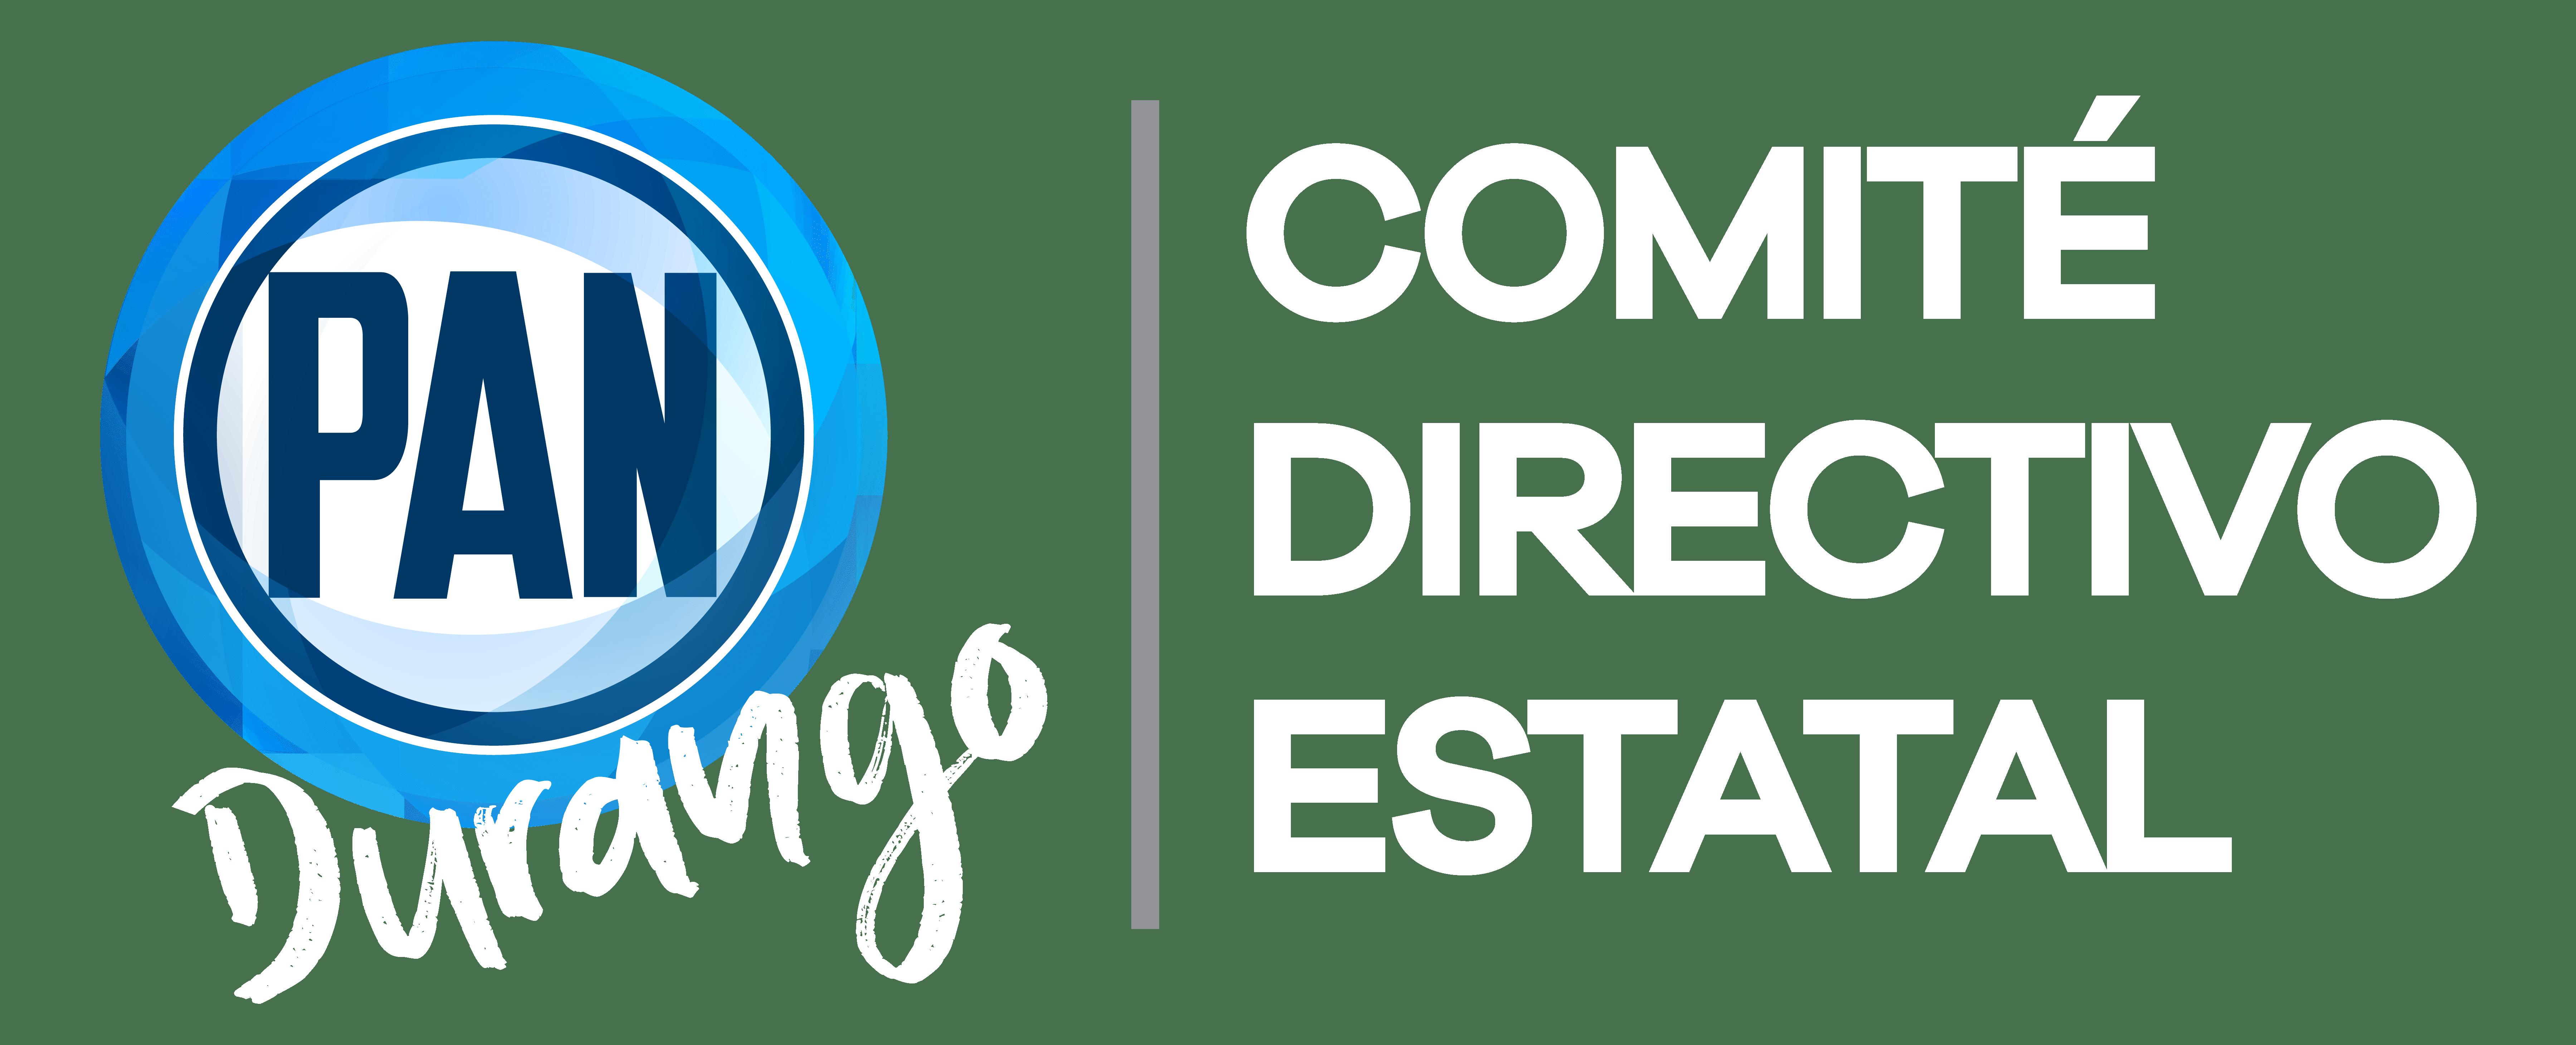 Comité Directivo Estatal